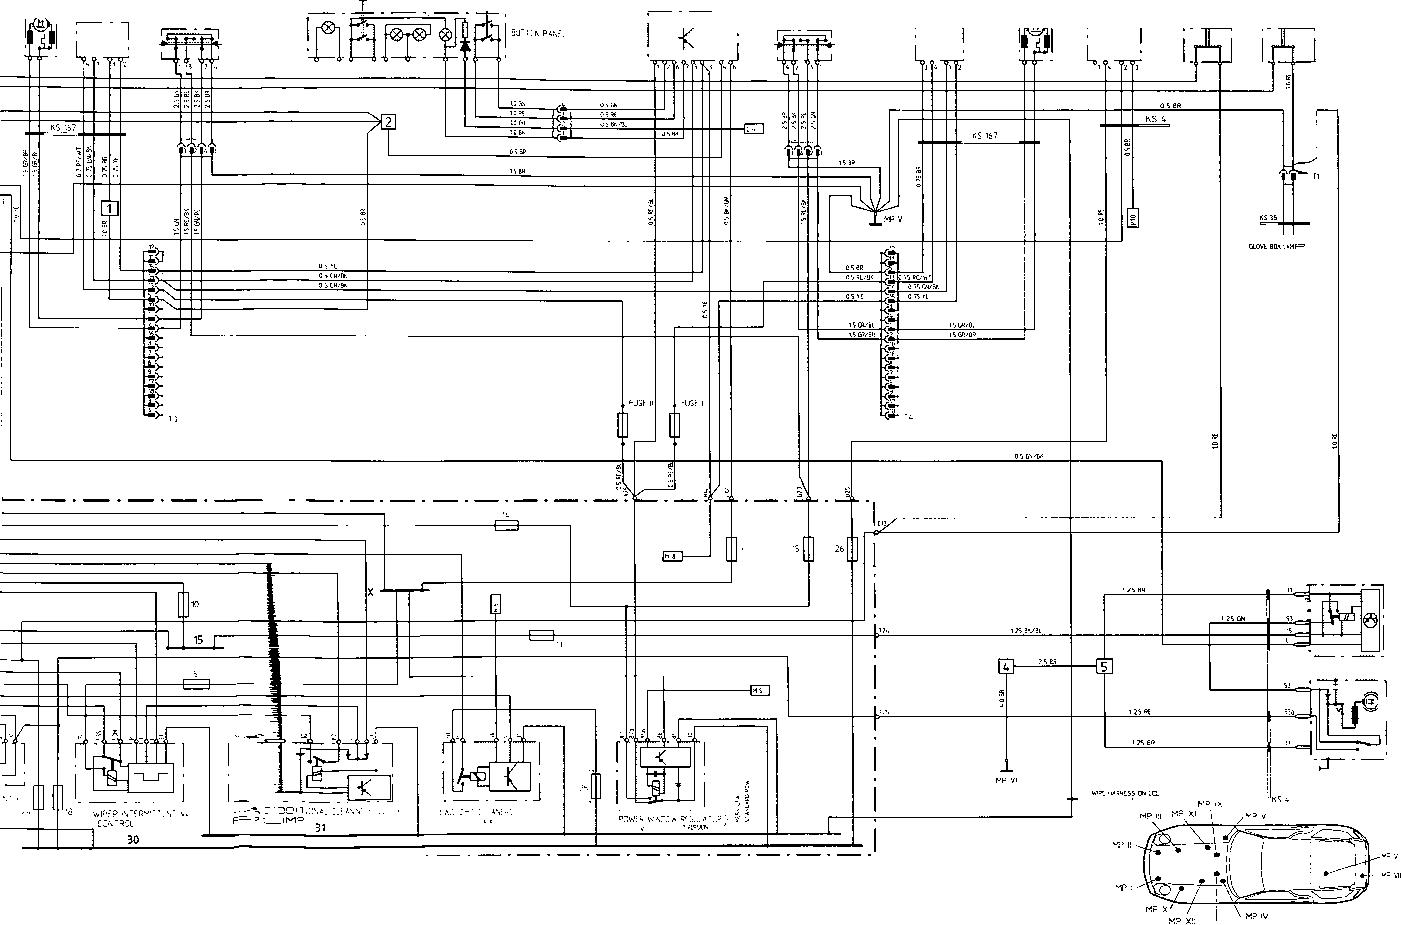 sanyo0174foglightwiringdiagramwire14gauge3wayconnectorjpg fav Wiring Schematics for Cars